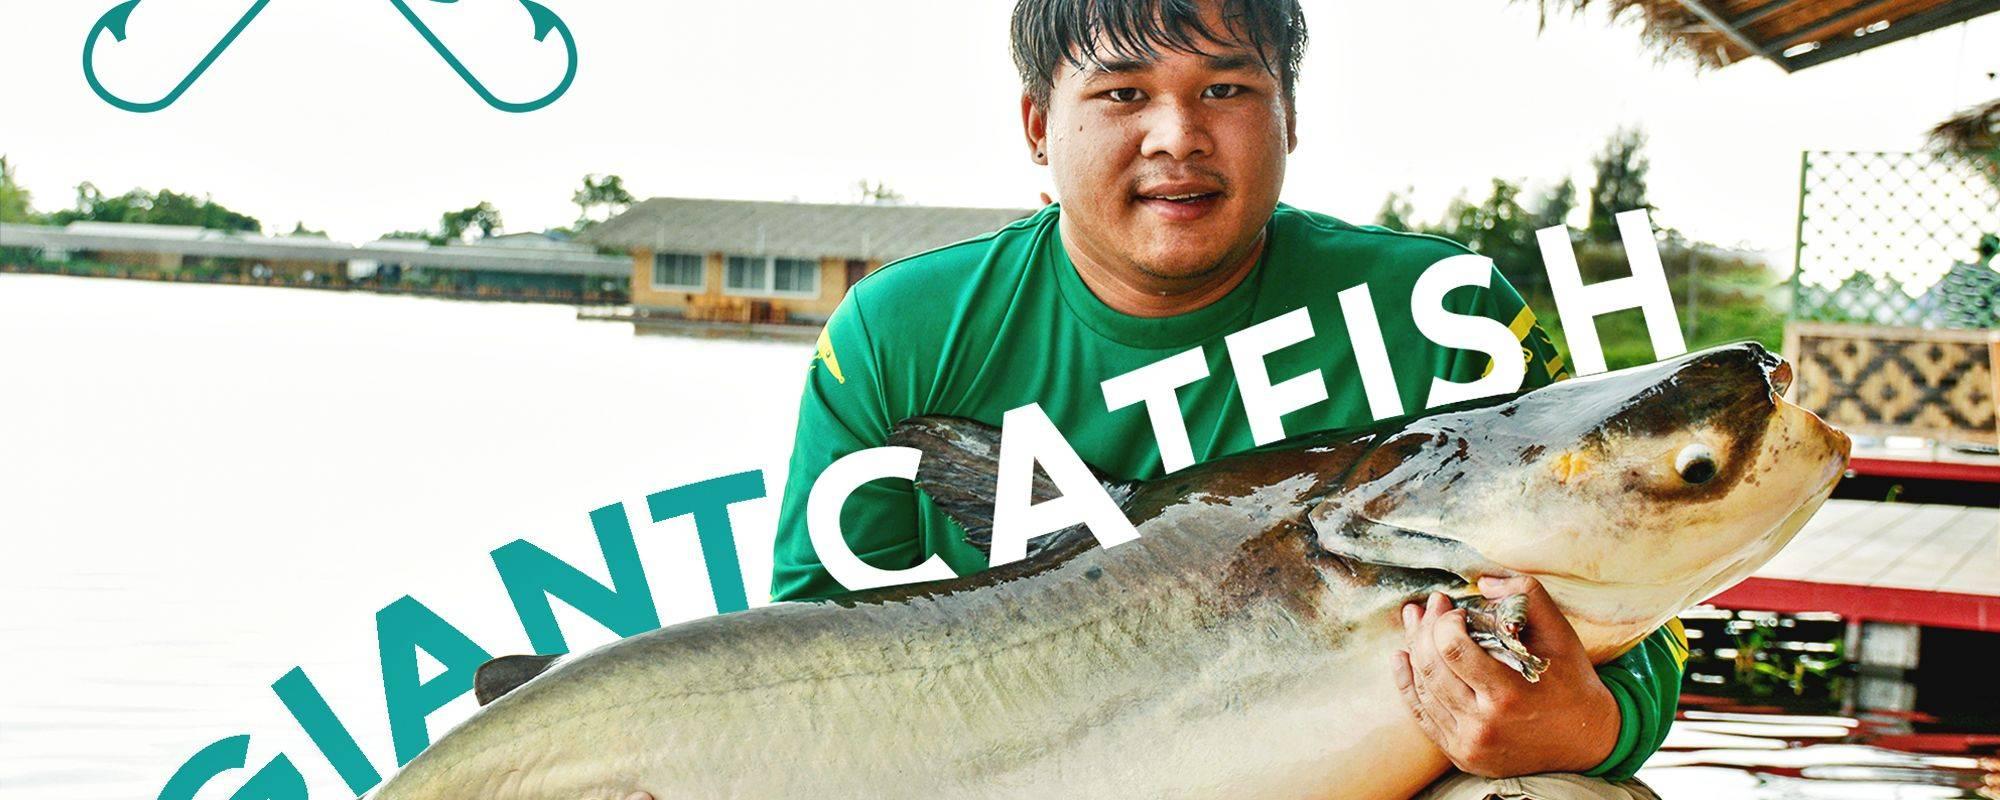 Fishing for Giant Catfish and Carp